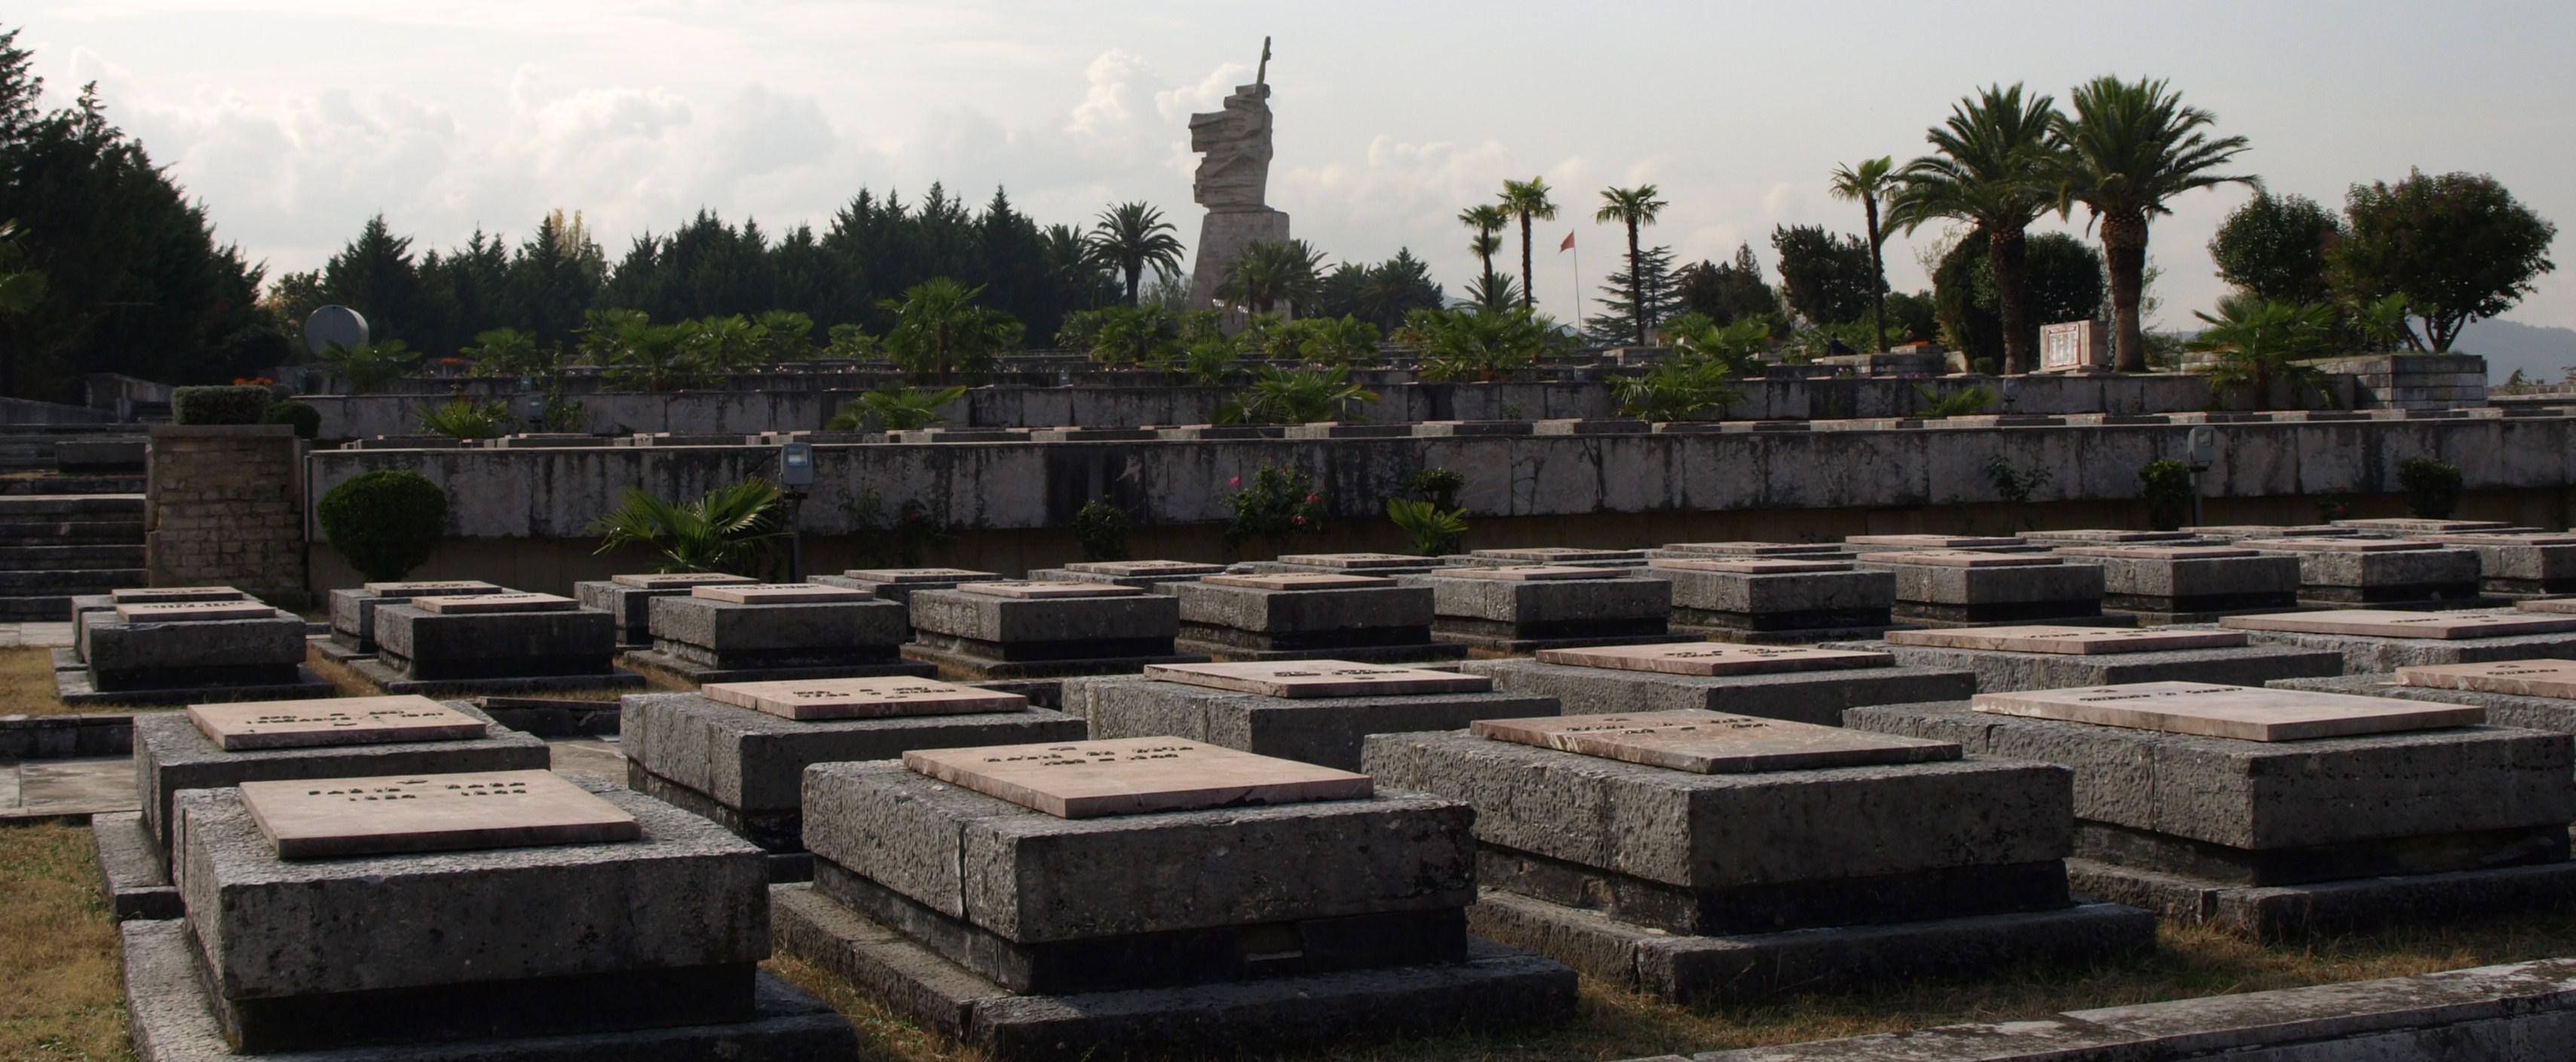 Tirana Martyrs' Cemetery - Partisan Memorials